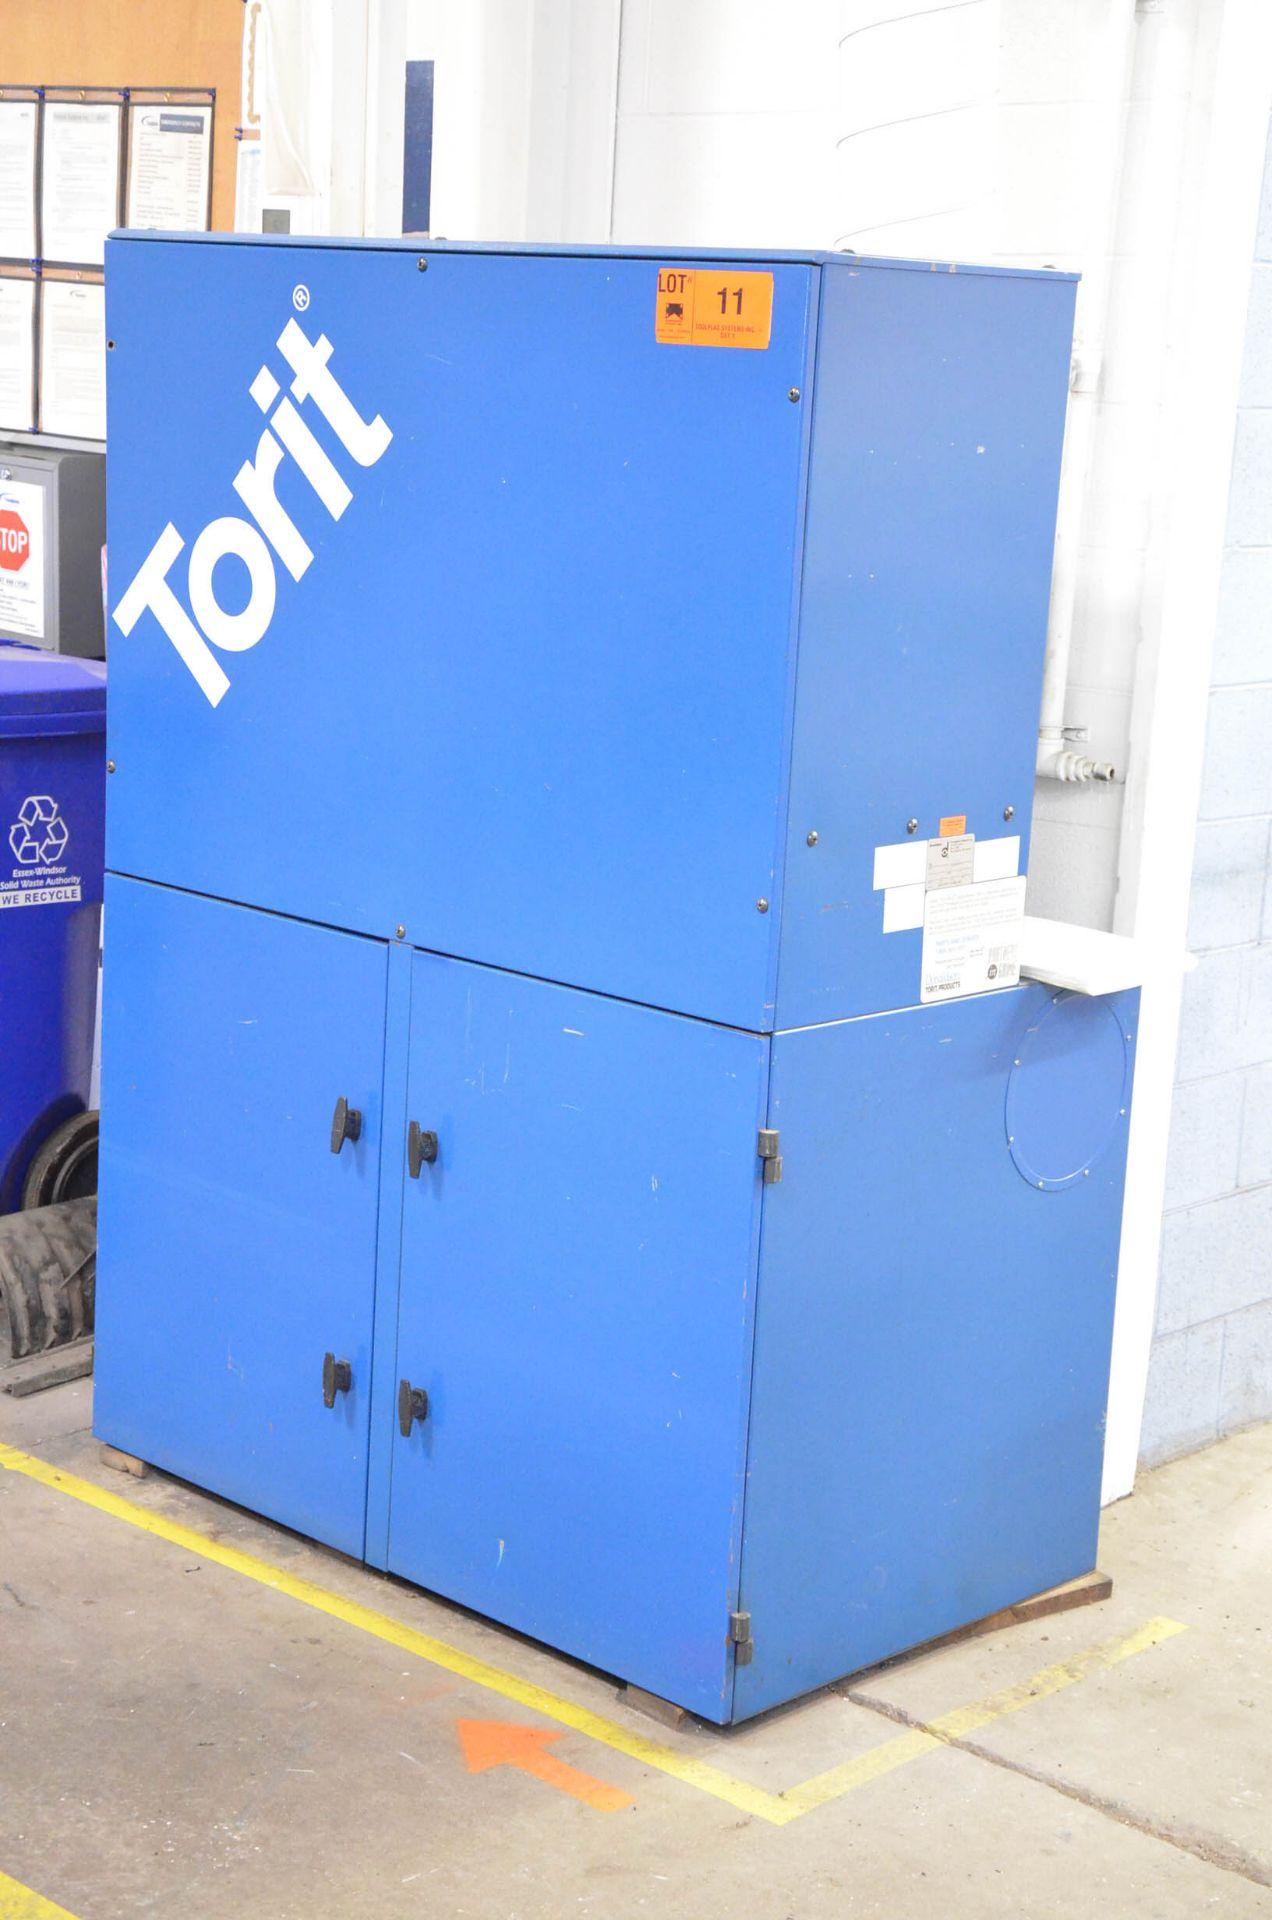 DONALDSON TORIT VS2400 5HP FLOOR-TYPE DUST COLLECTOR, 575V/3PH/60HZ, S/N: IG524206 (CI) [RIGGING